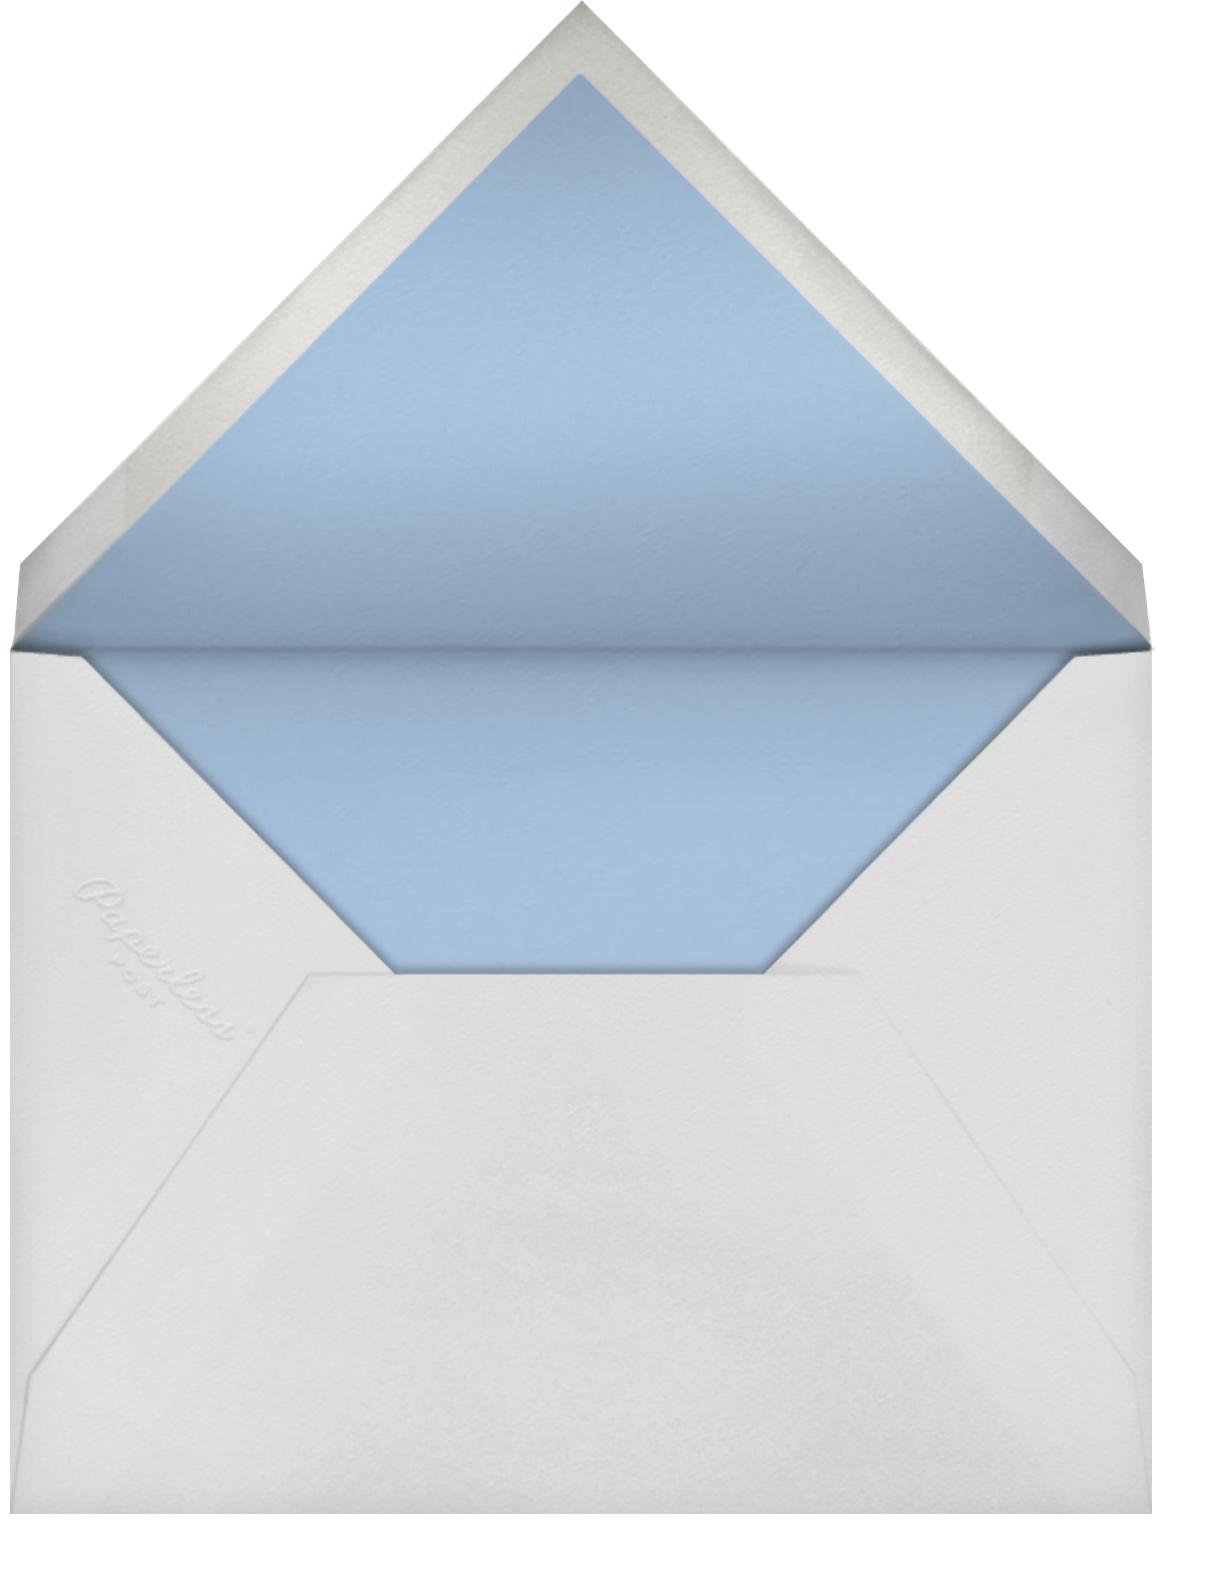 Off the Rack - Paperless Post - Bridal shower - envelope back